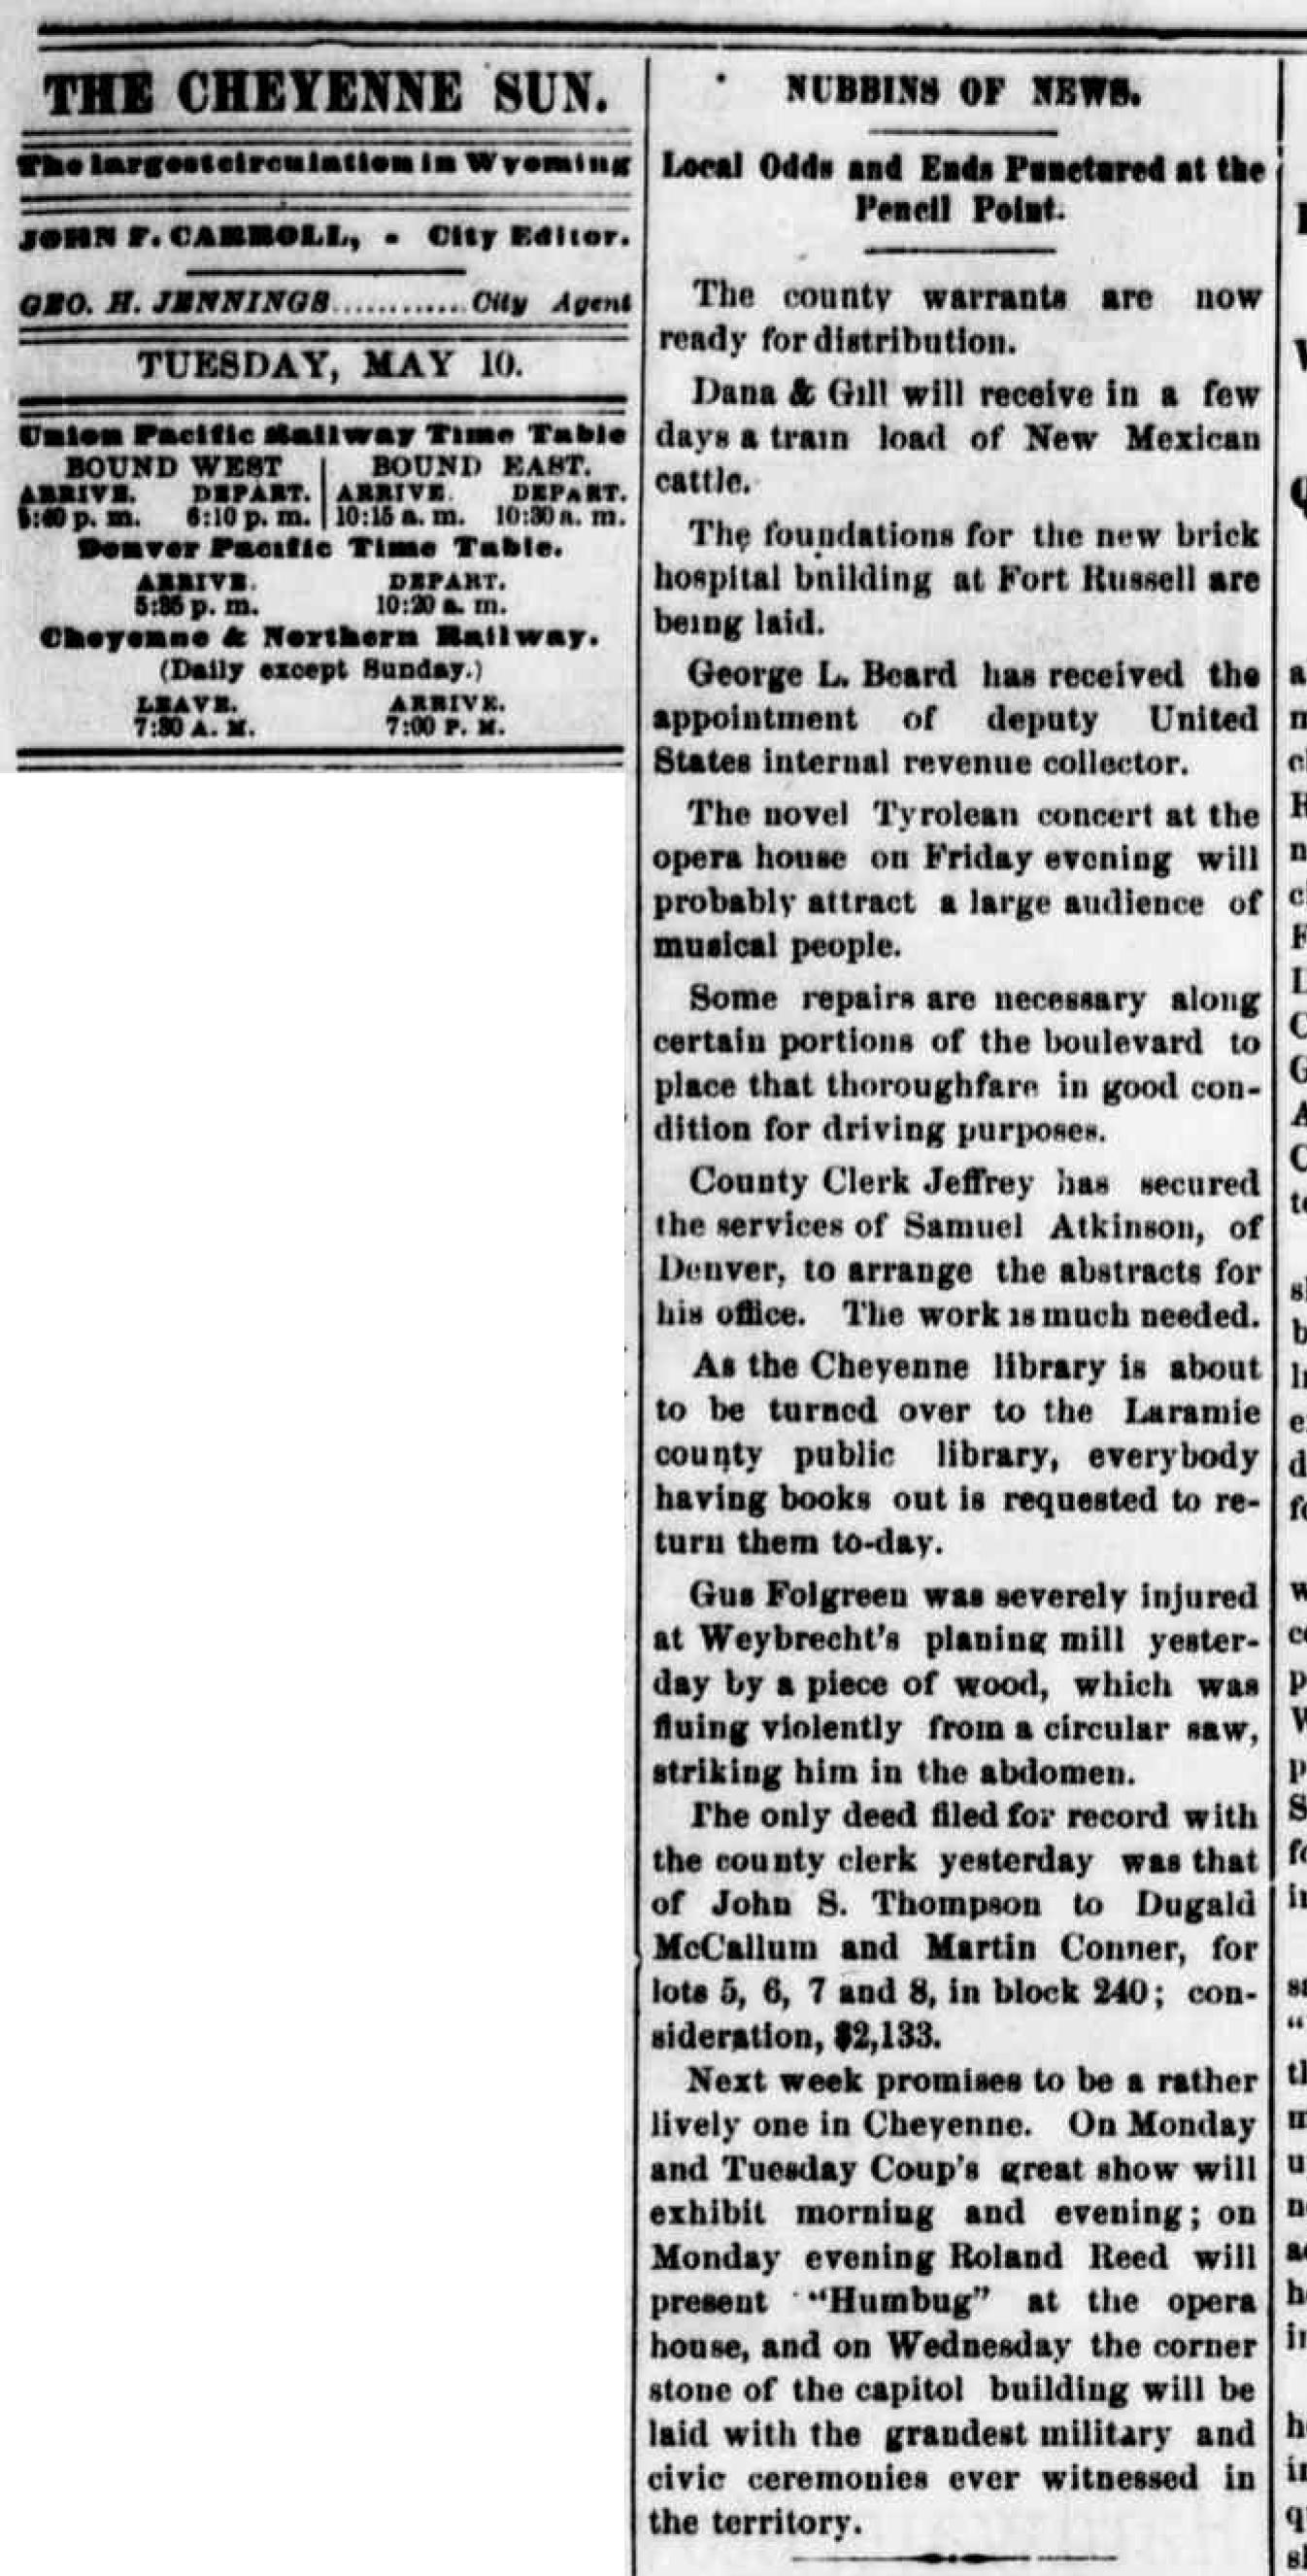 1887-Cheyenne Daily Sun no. 52 May 10, 1887, page 3-Roland-cornetstone0-2.jpg